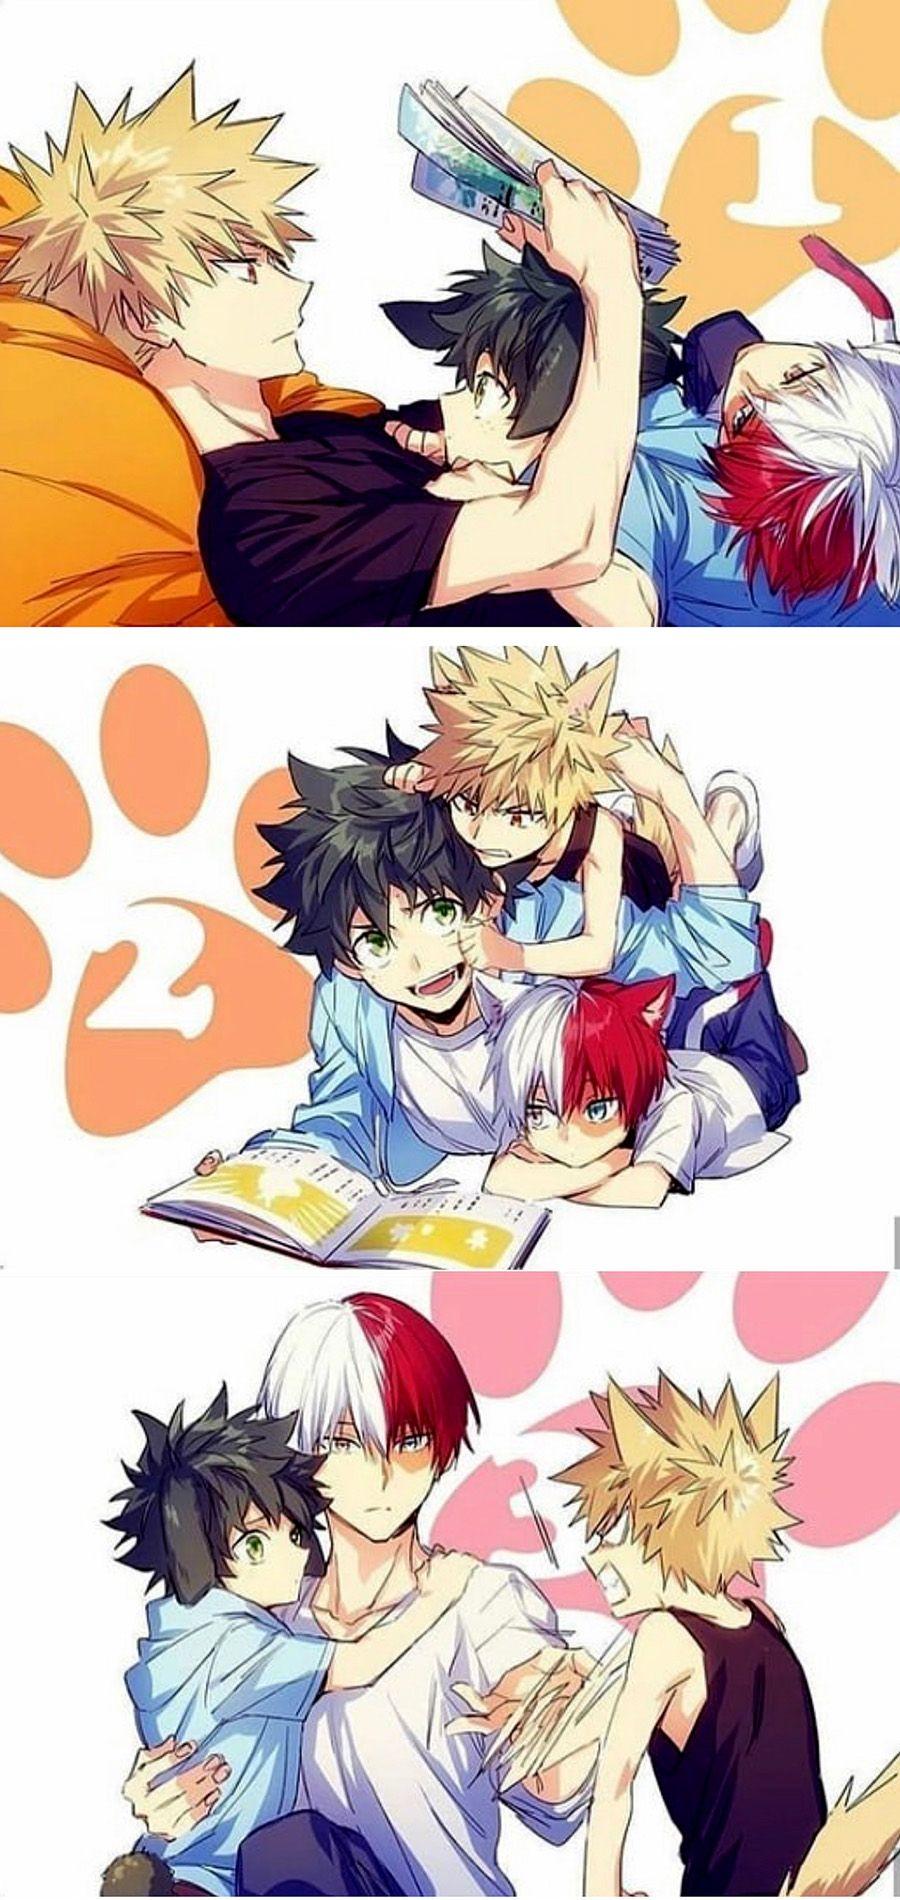 Todobakudeku Bnha My Hero Academia Episodes My Hero Academia Shouto My Hero Academia Manga